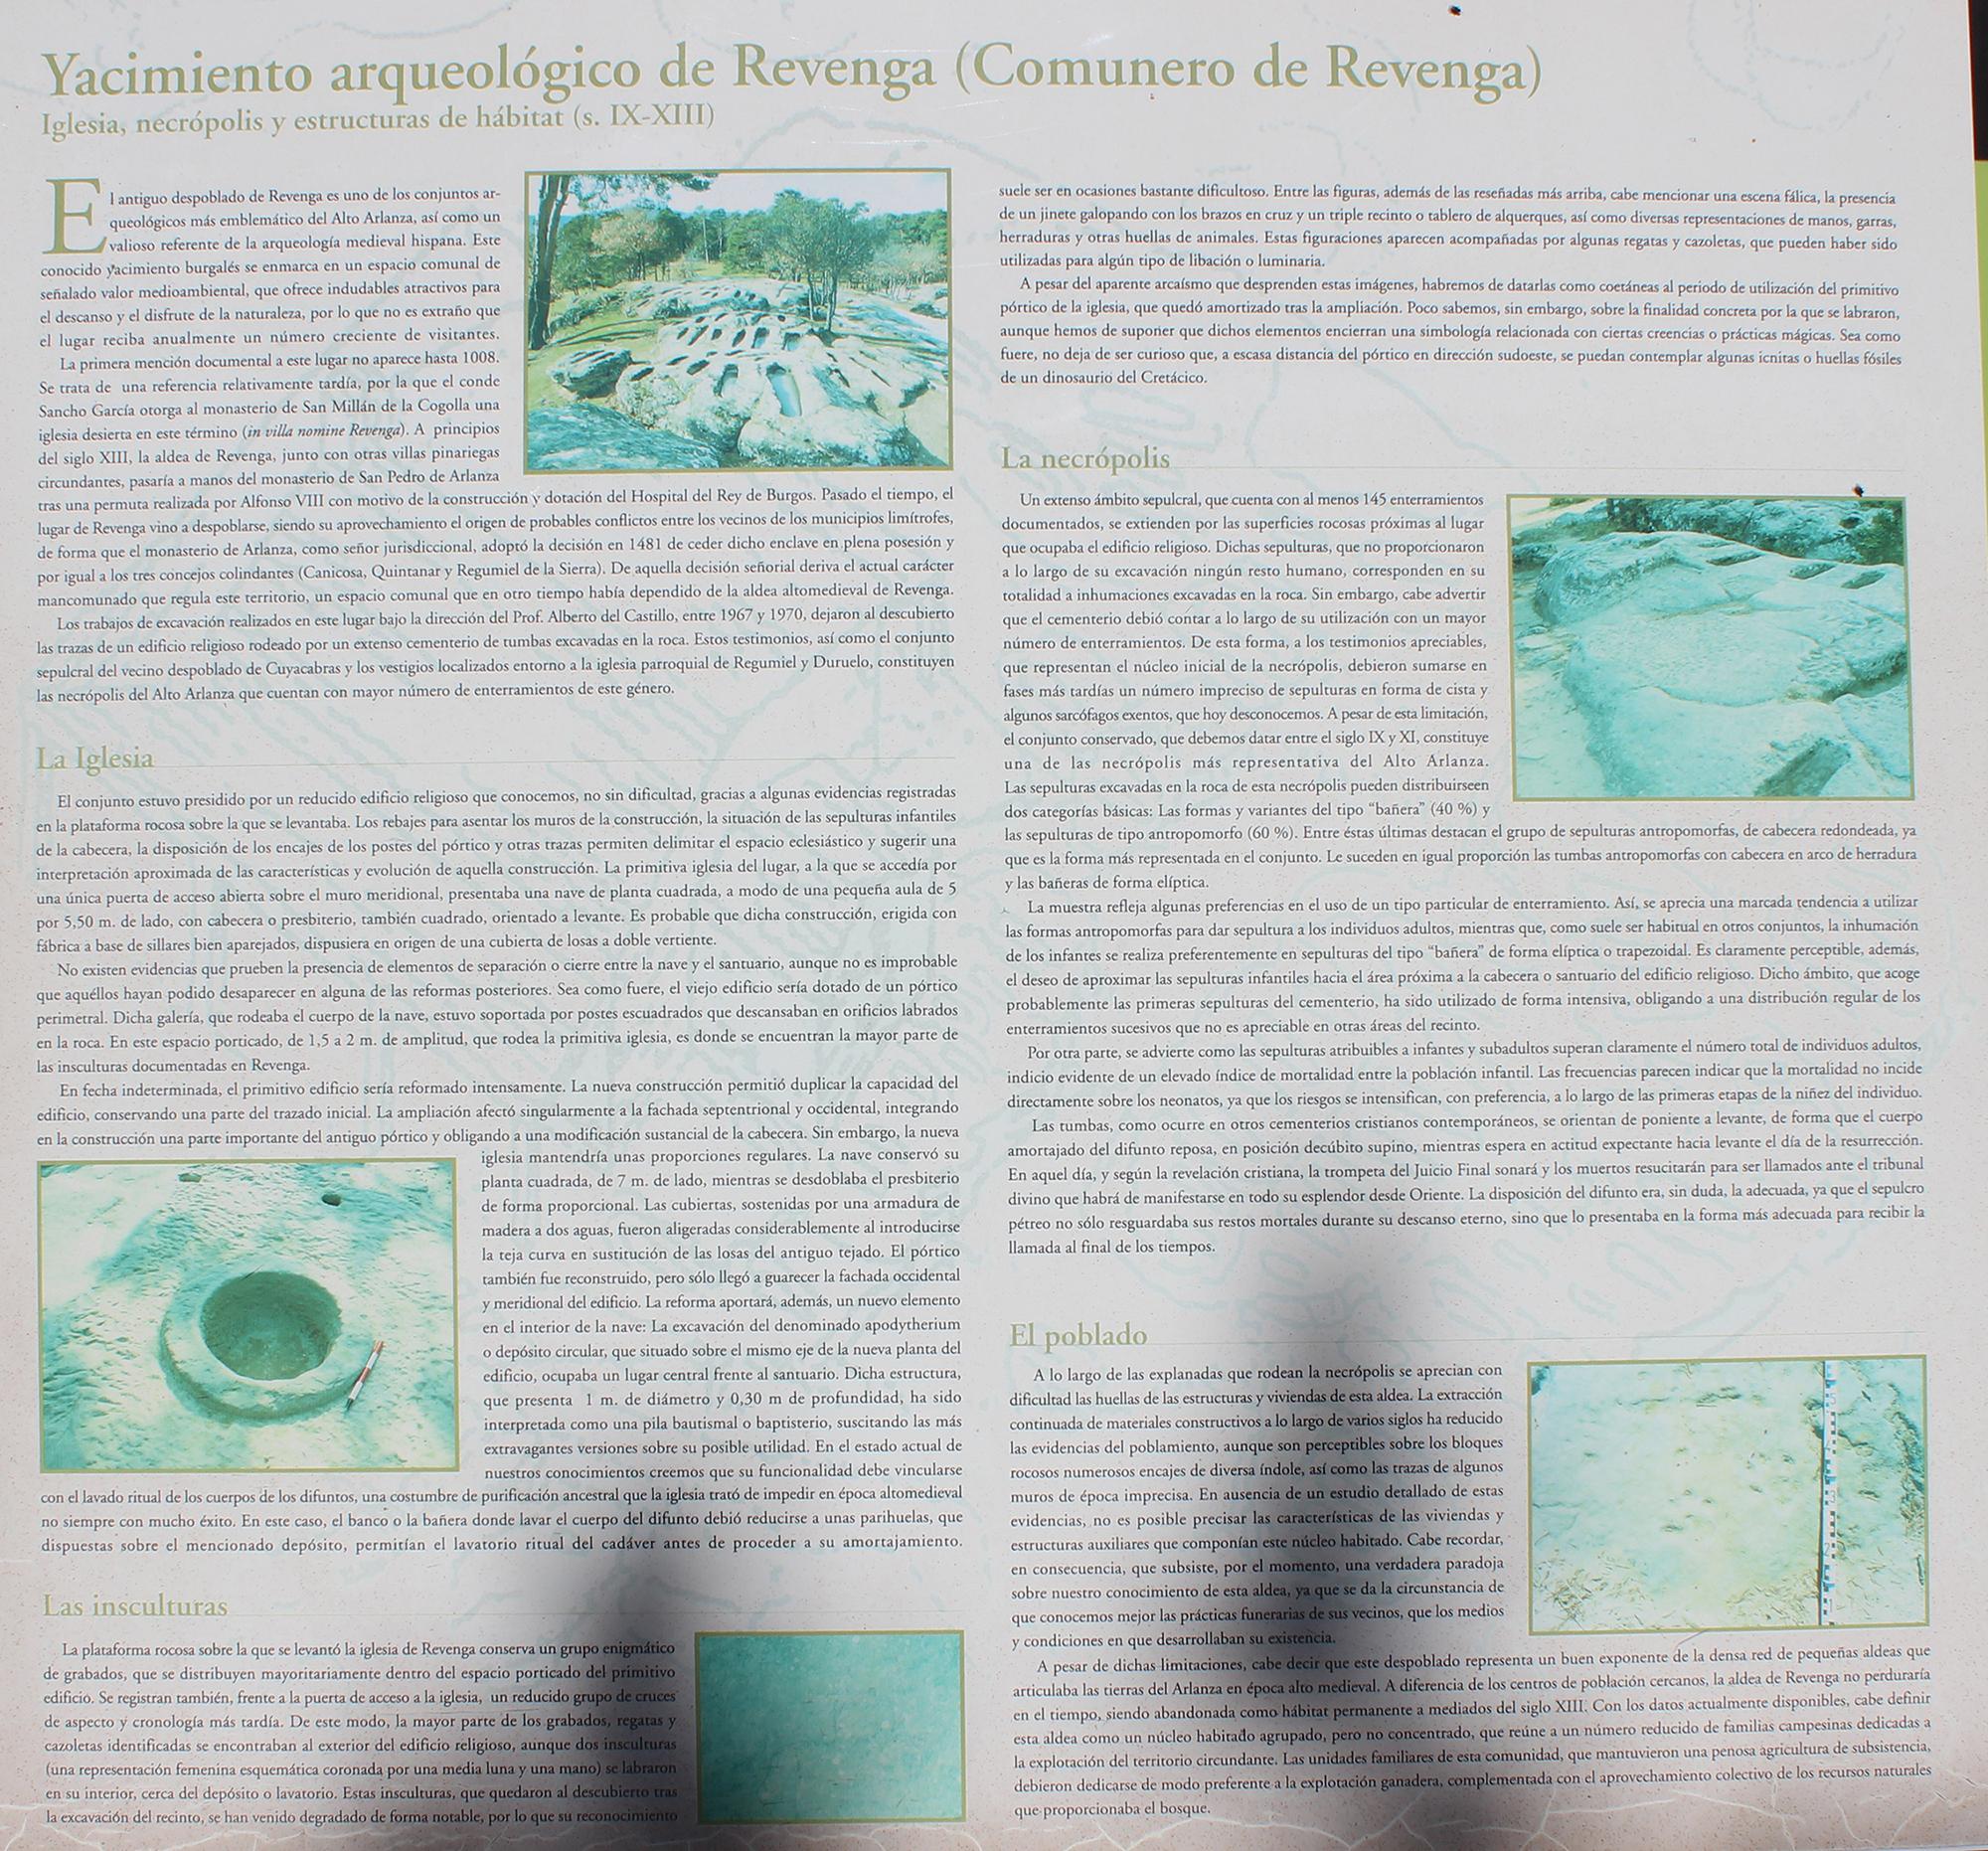 yacimiento arqueologico de revenga información